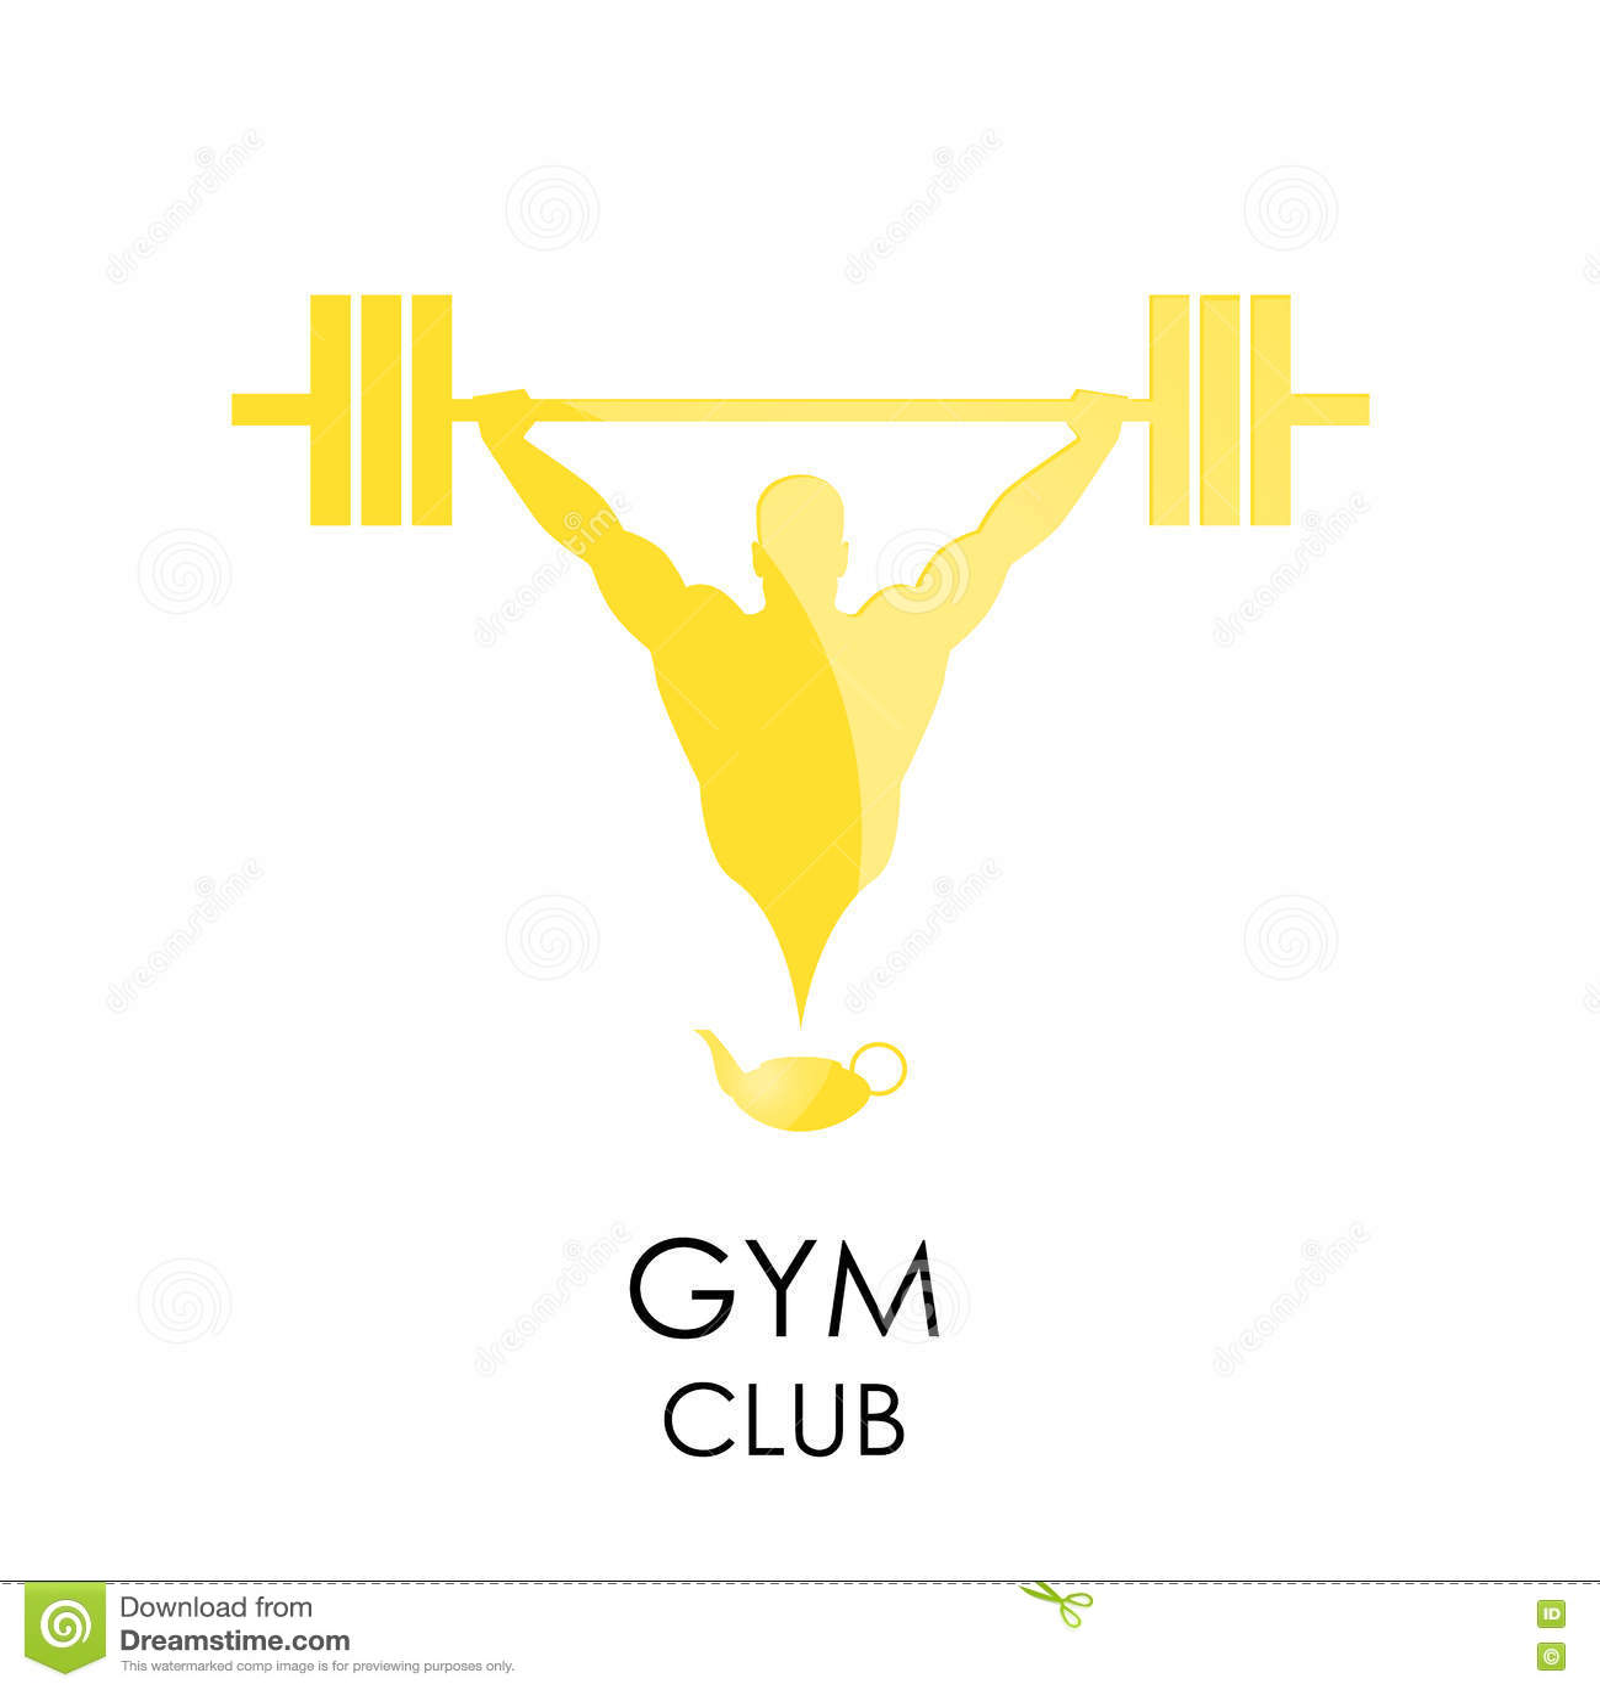 Gym club logotype sport fitness creative concept stock for Gimnasio fitness club